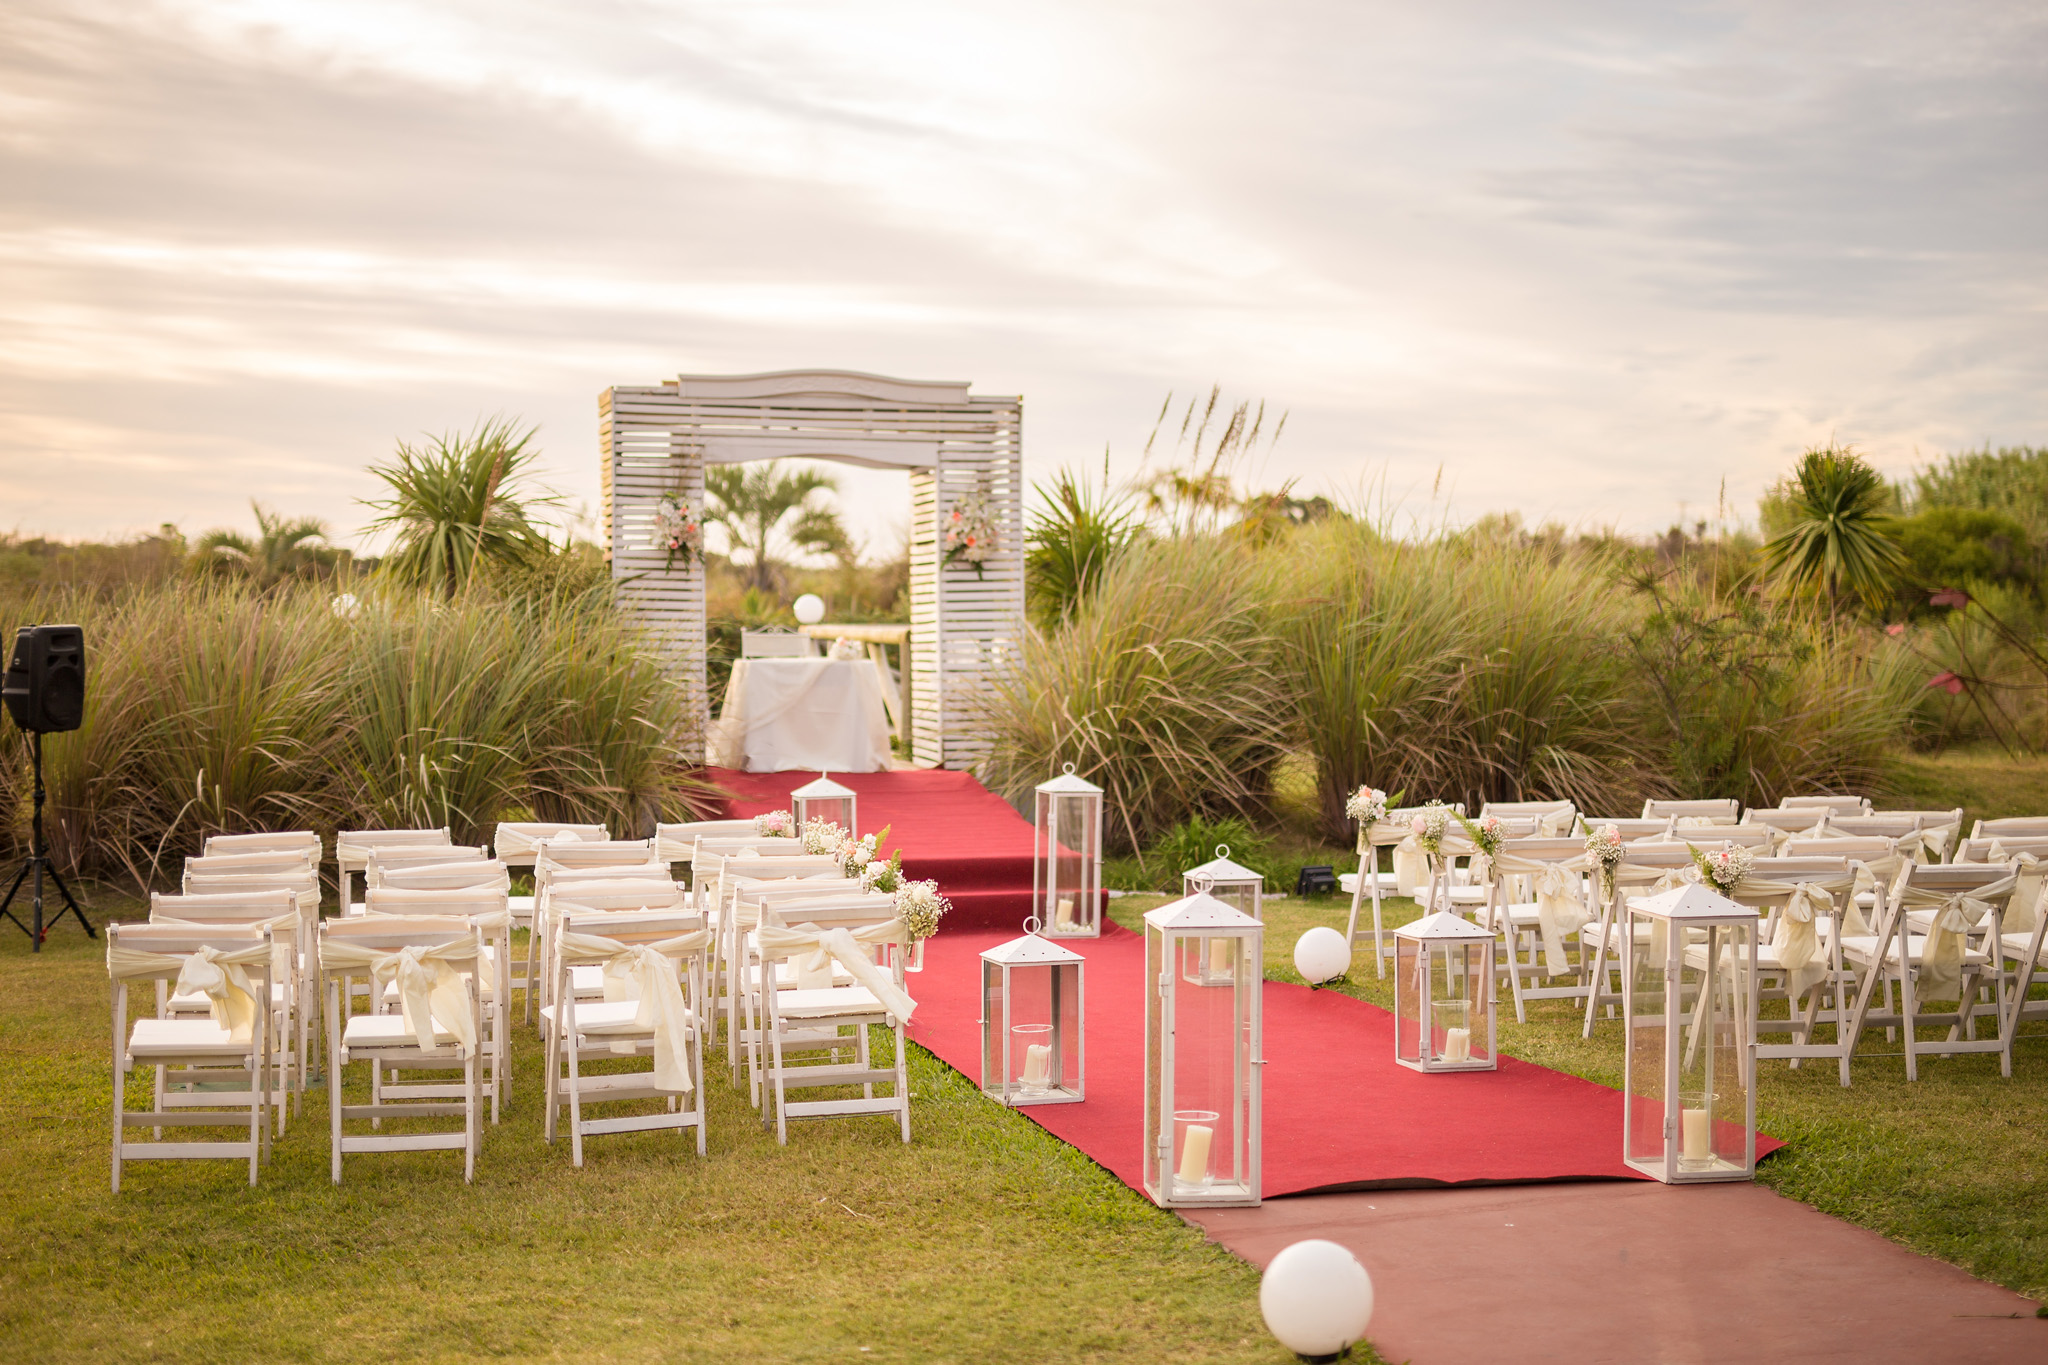 Wedding_Travellers_Destination_Wedding_Photography-3.jpg